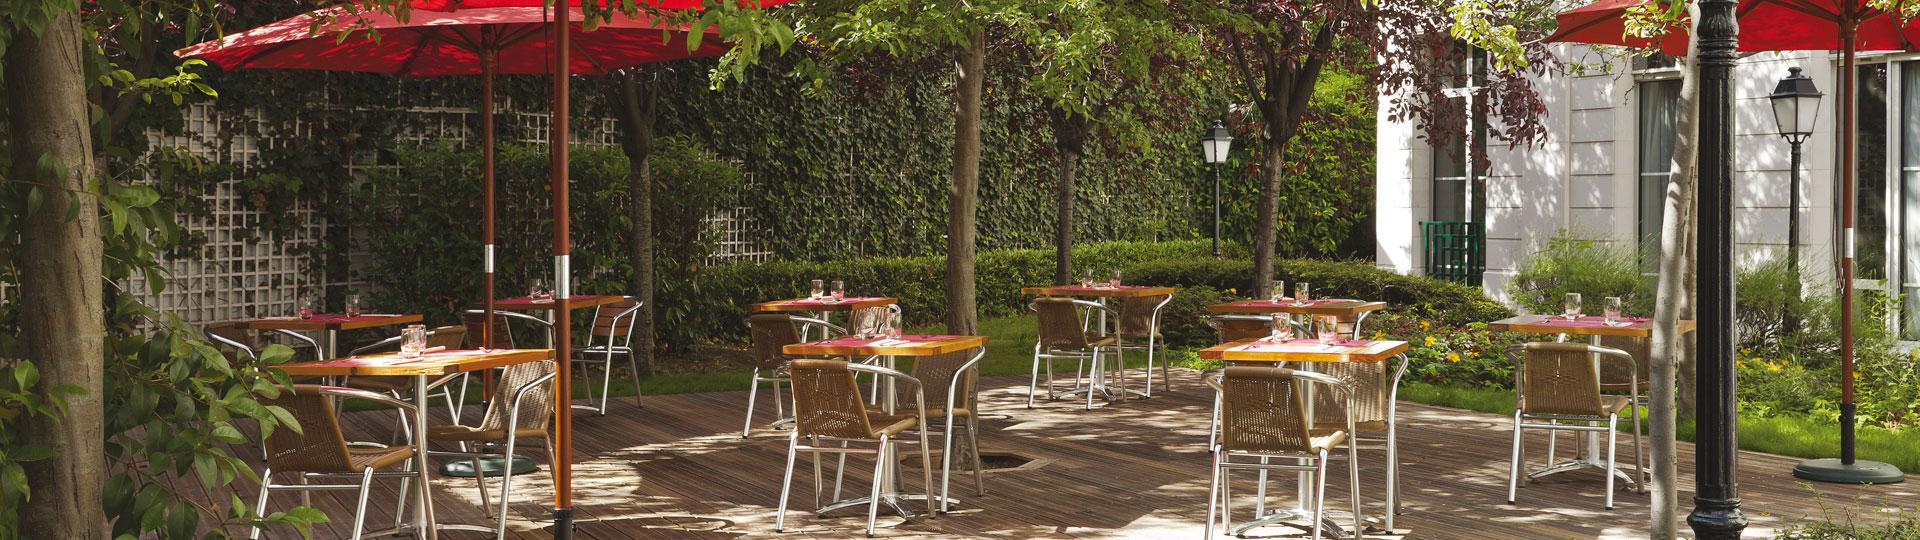 Hotel centre de Paris avec Jardin